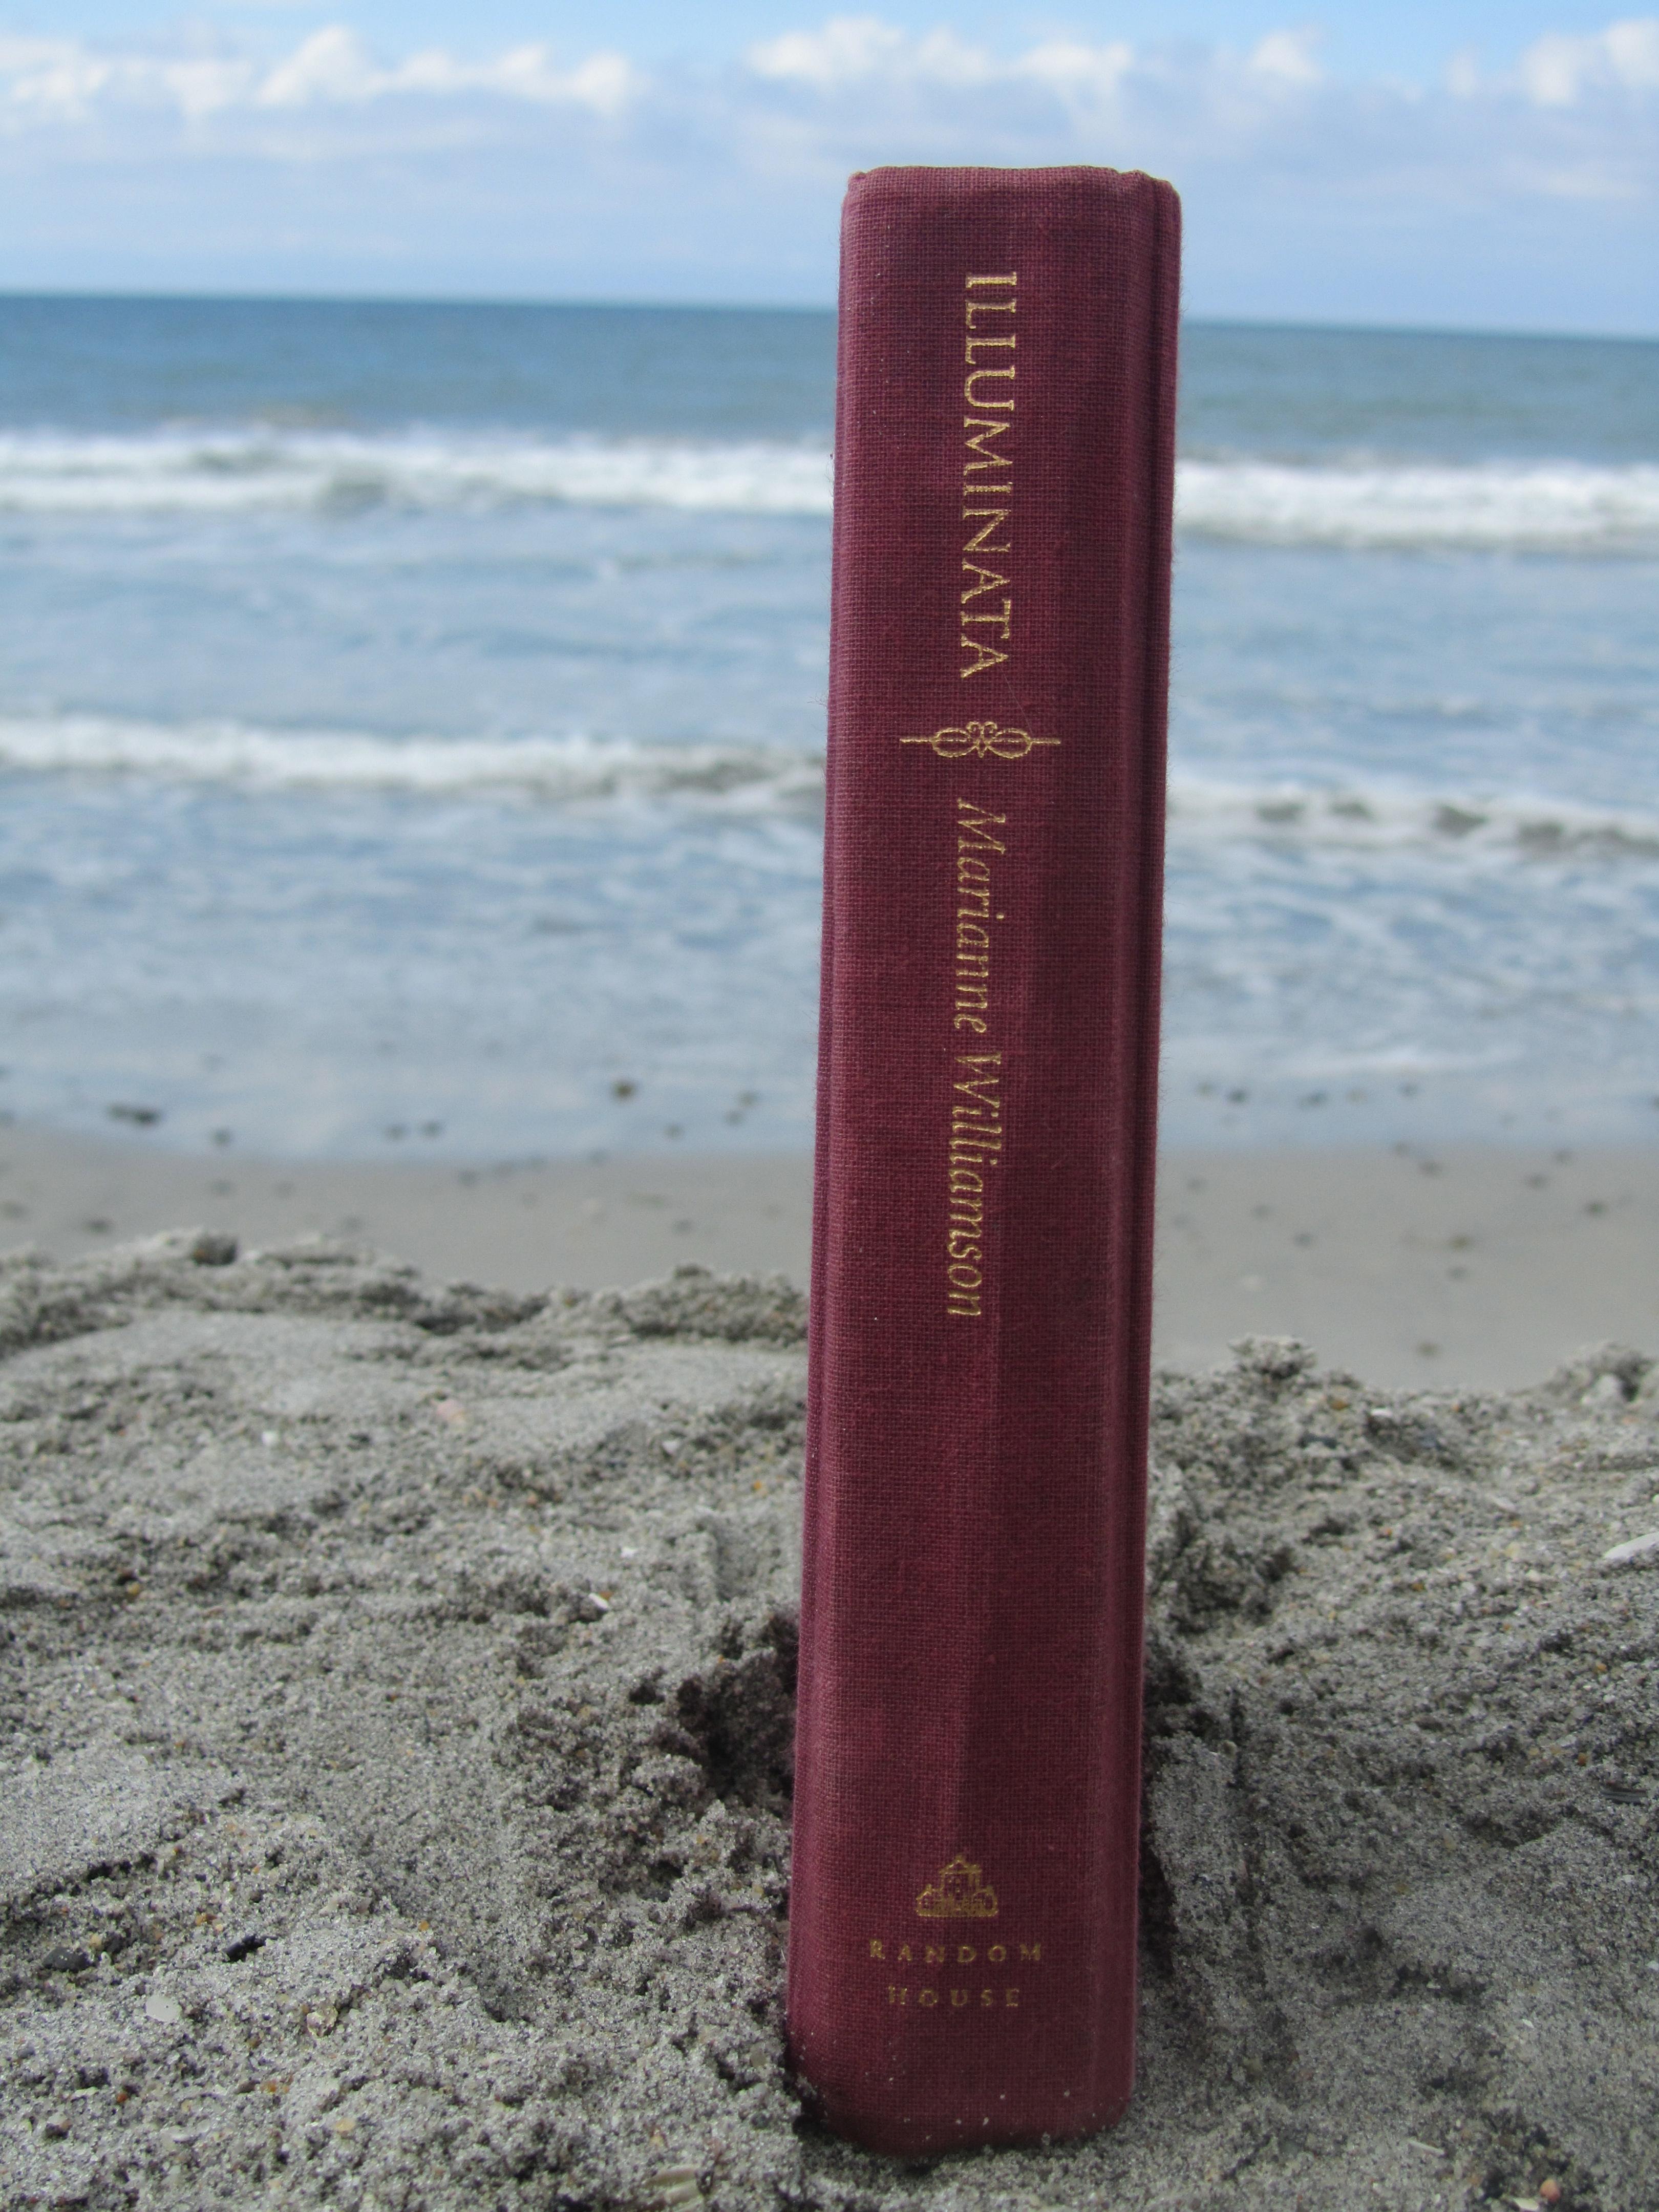 prayer on the beach